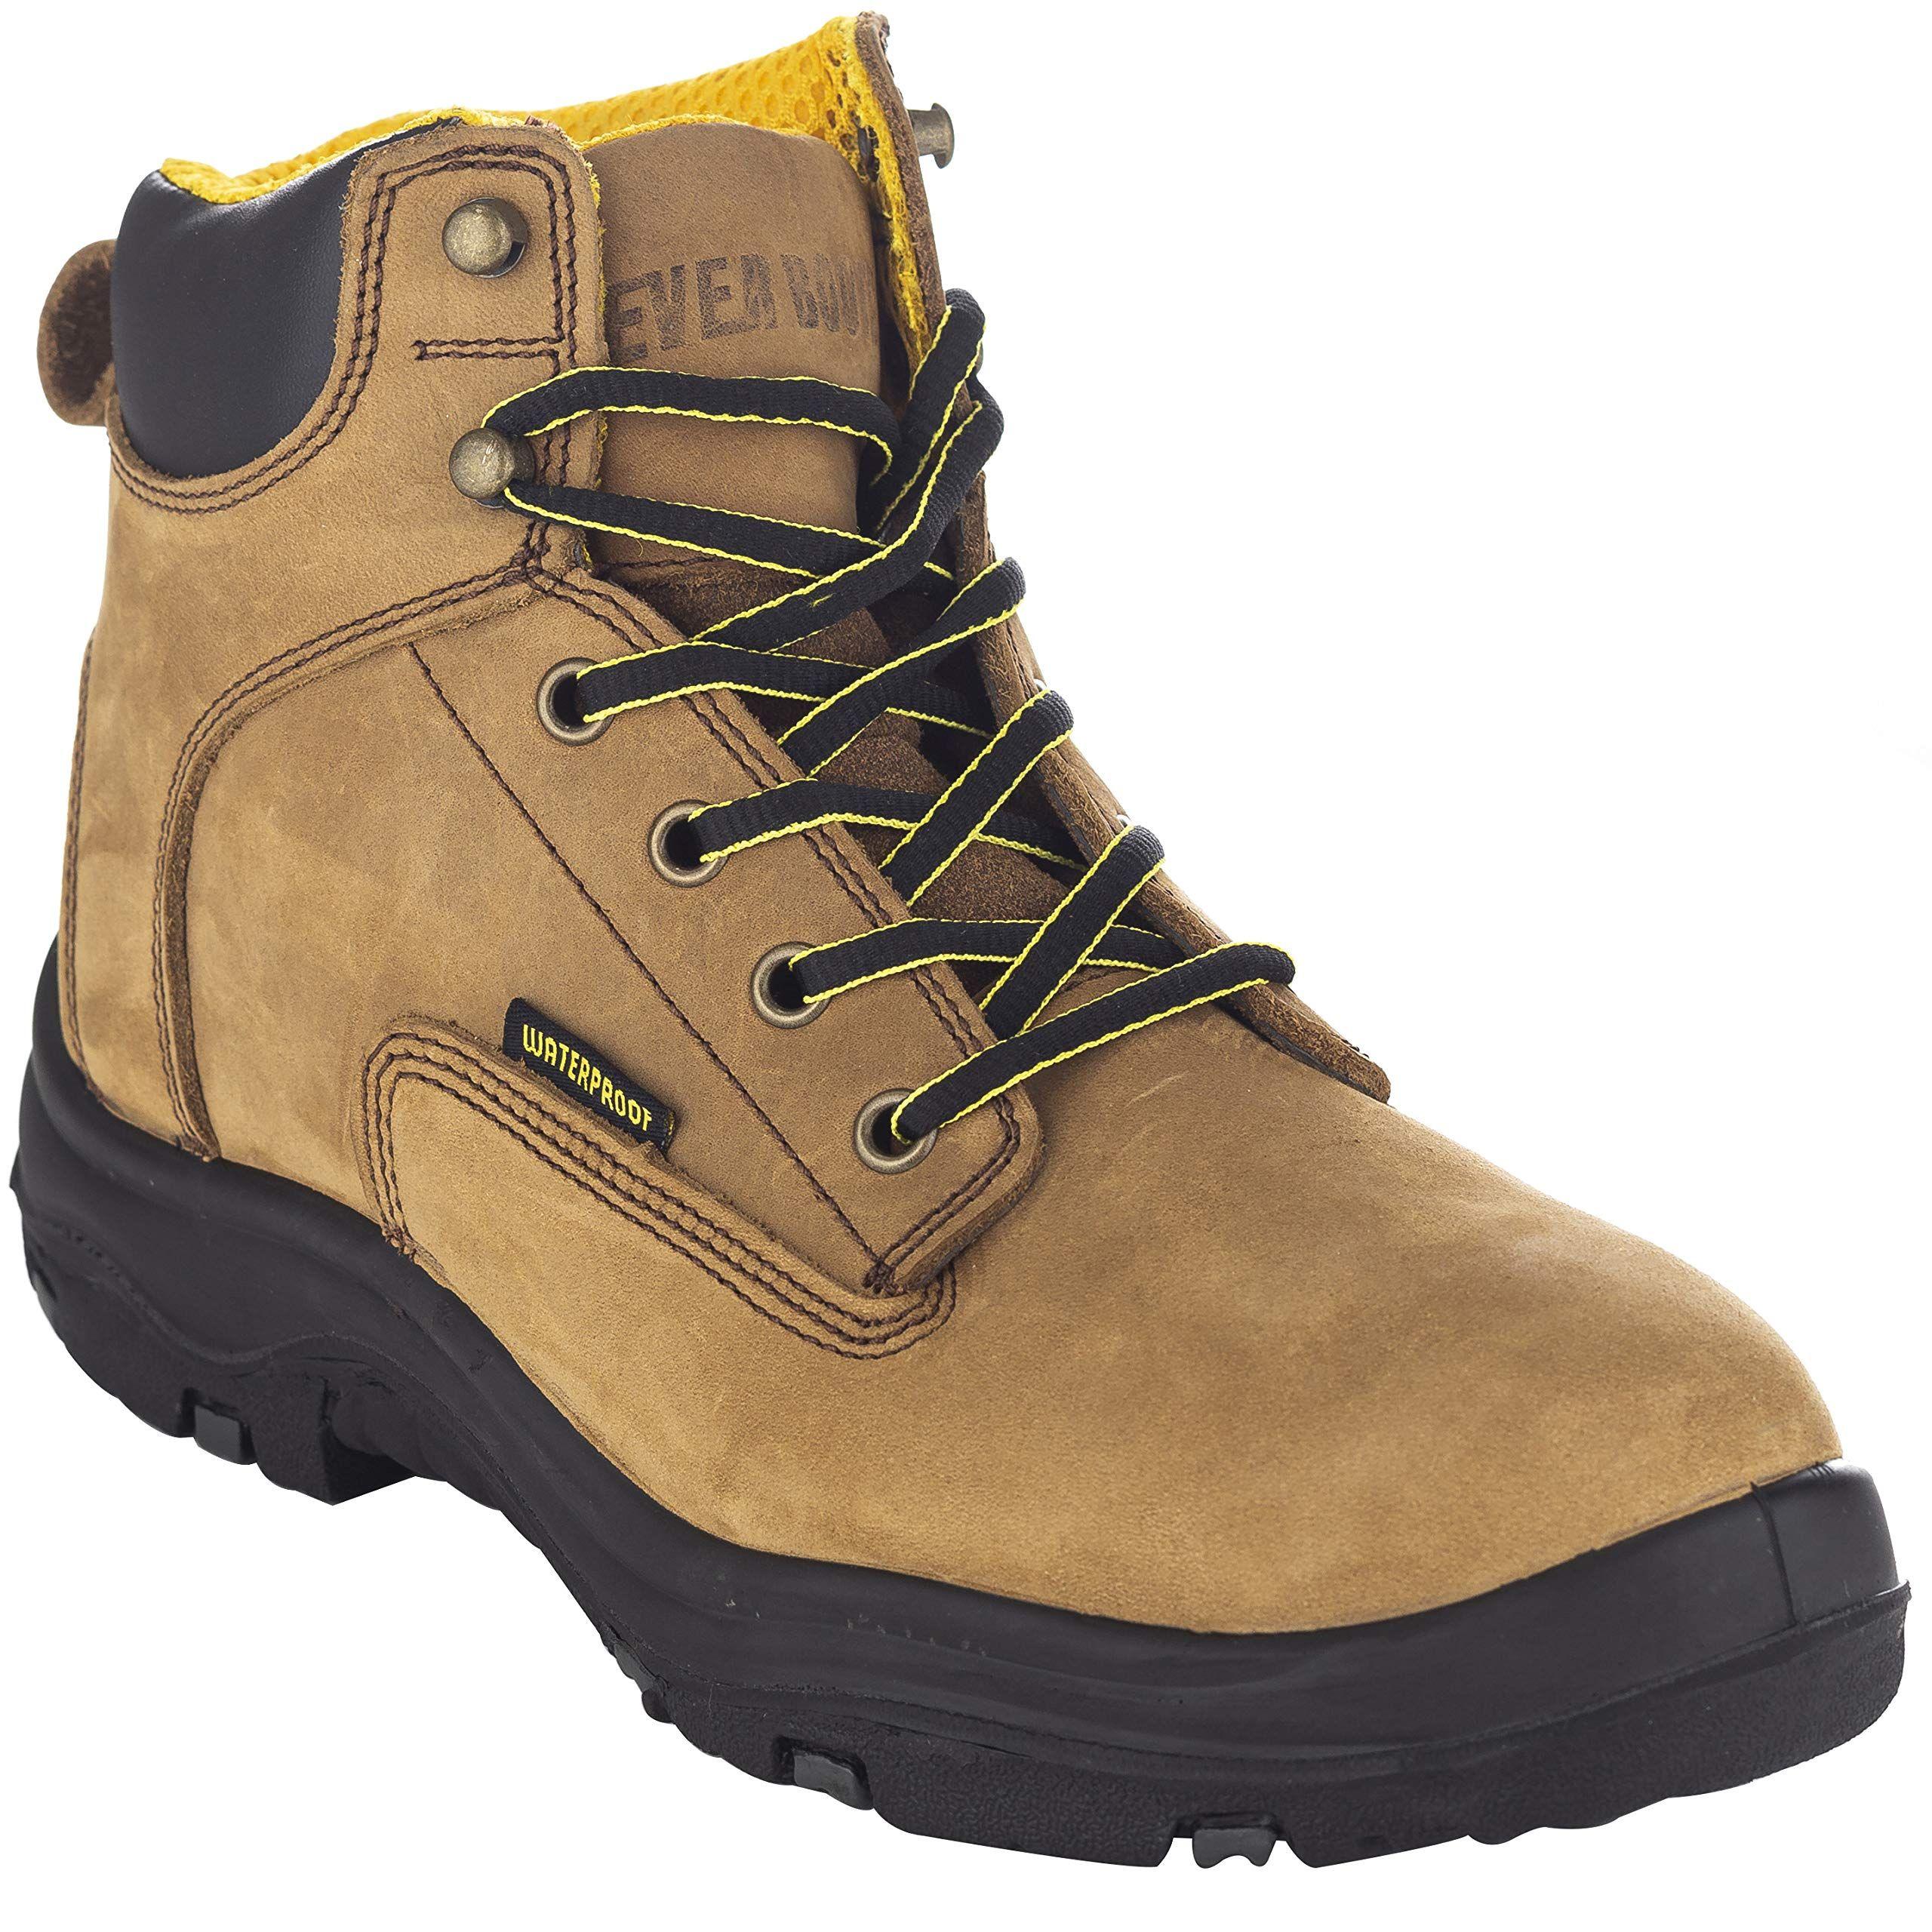 Premium Leather Waterproof Work Boots